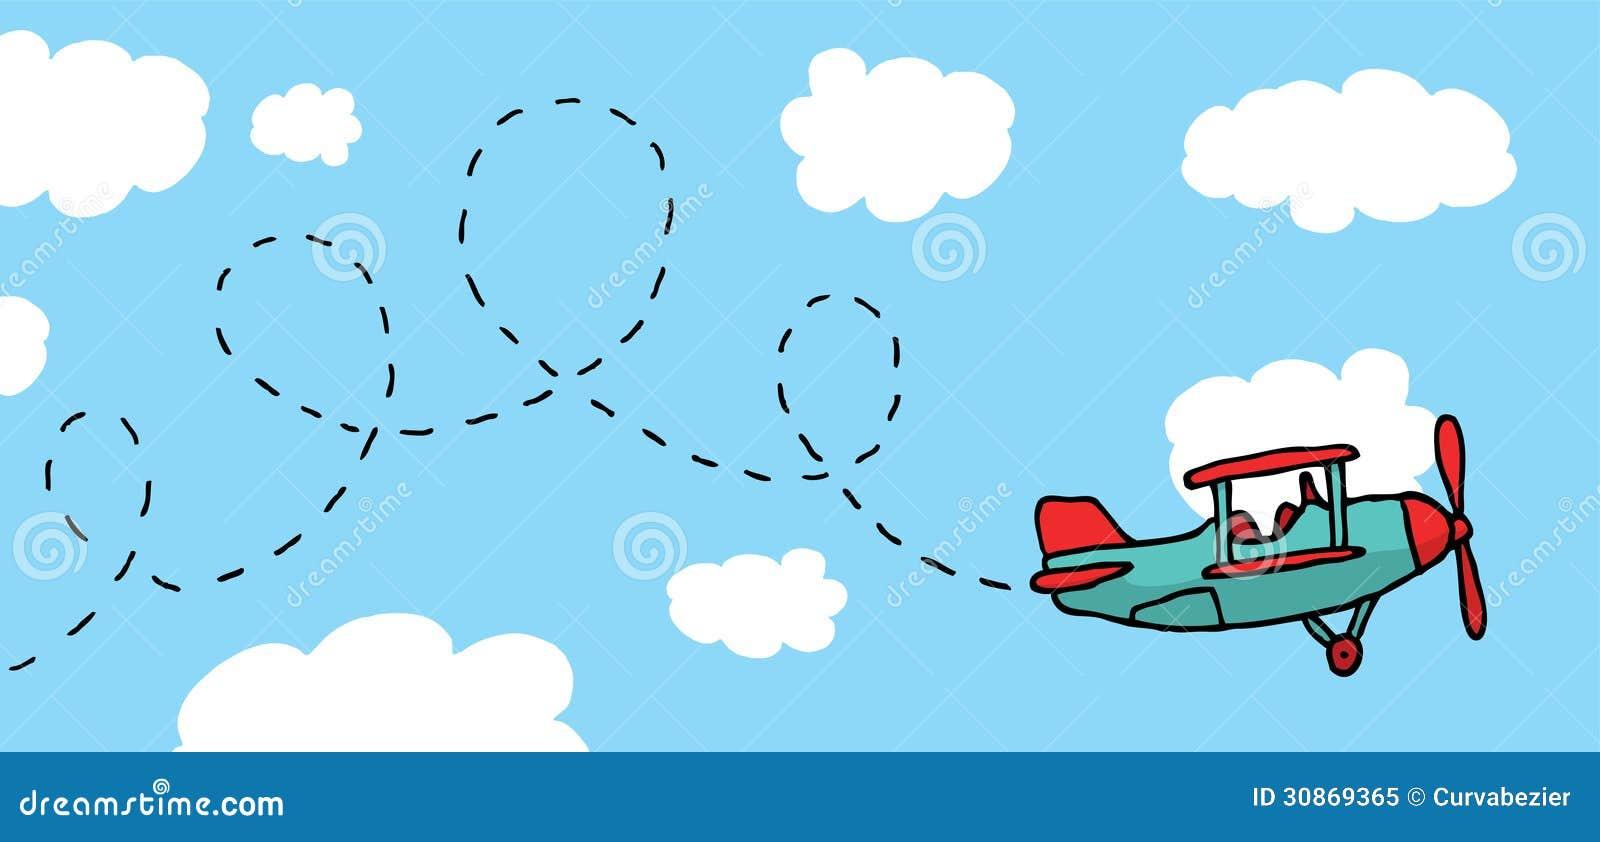 Playful Cartoon Airplane Flying Stock Illustration Illustration